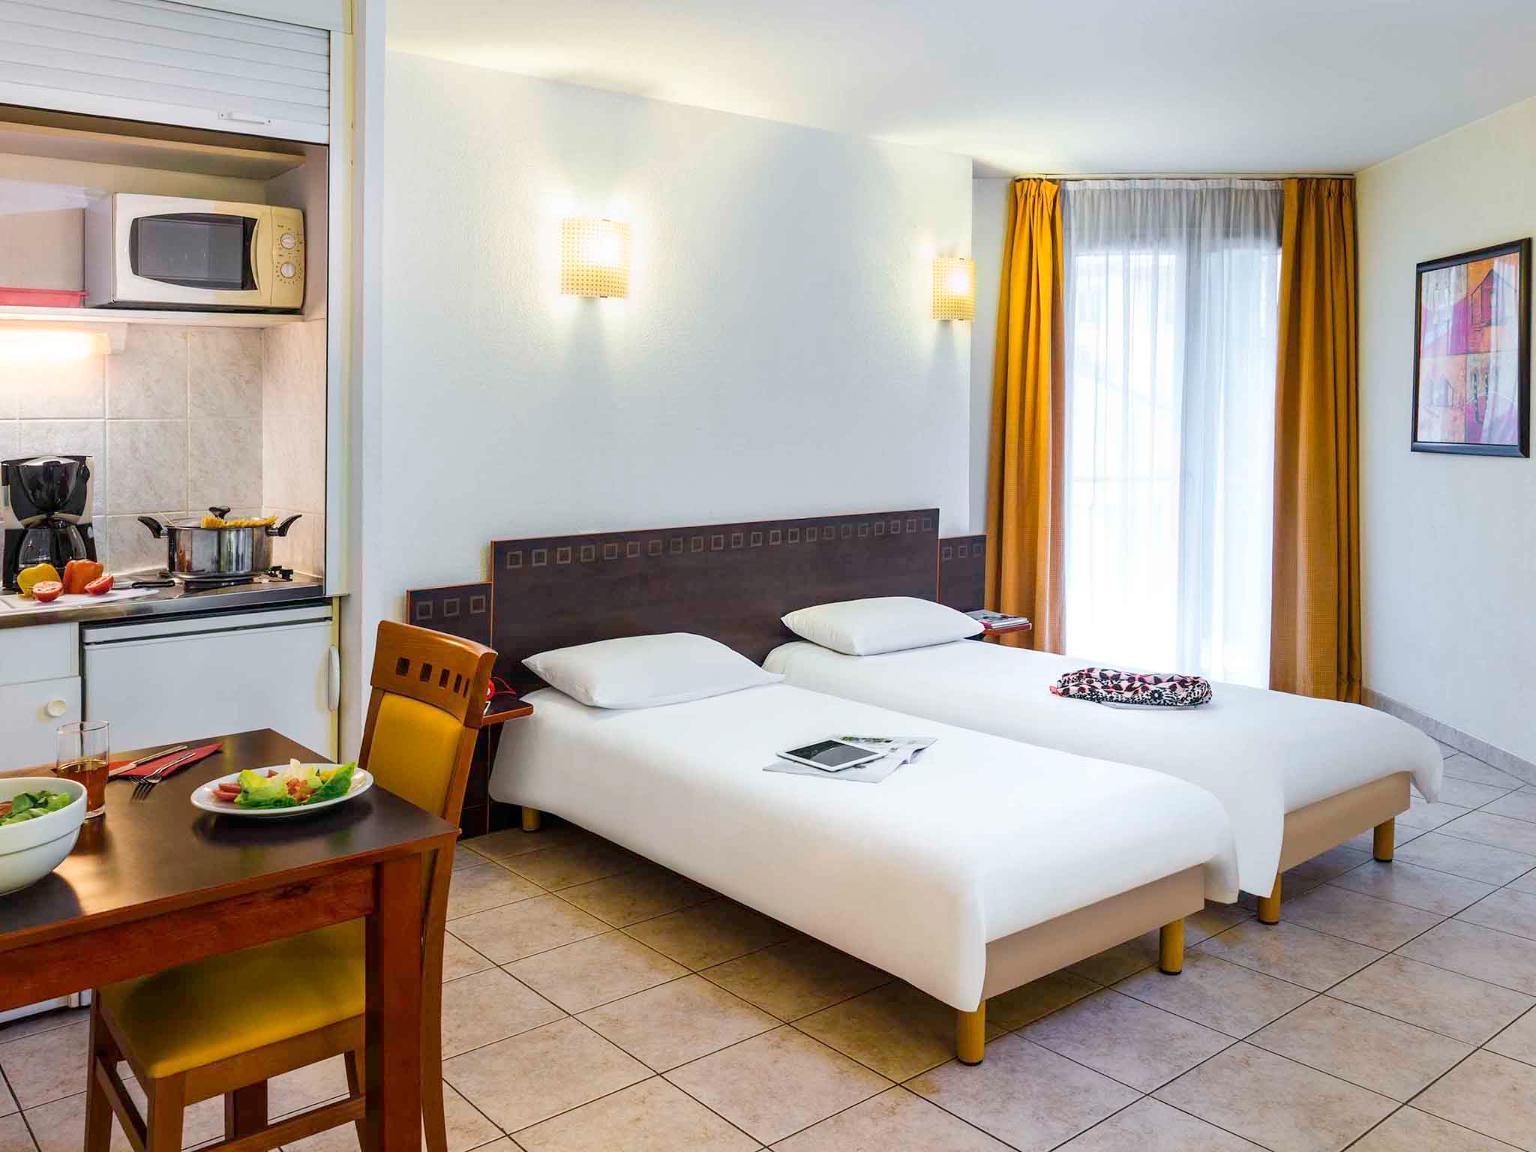 Aparthotel adagio access nice acropolis h tel 42 boulevard risso 06000 nice adresse horaire - Hotel meuble au mois nice ...